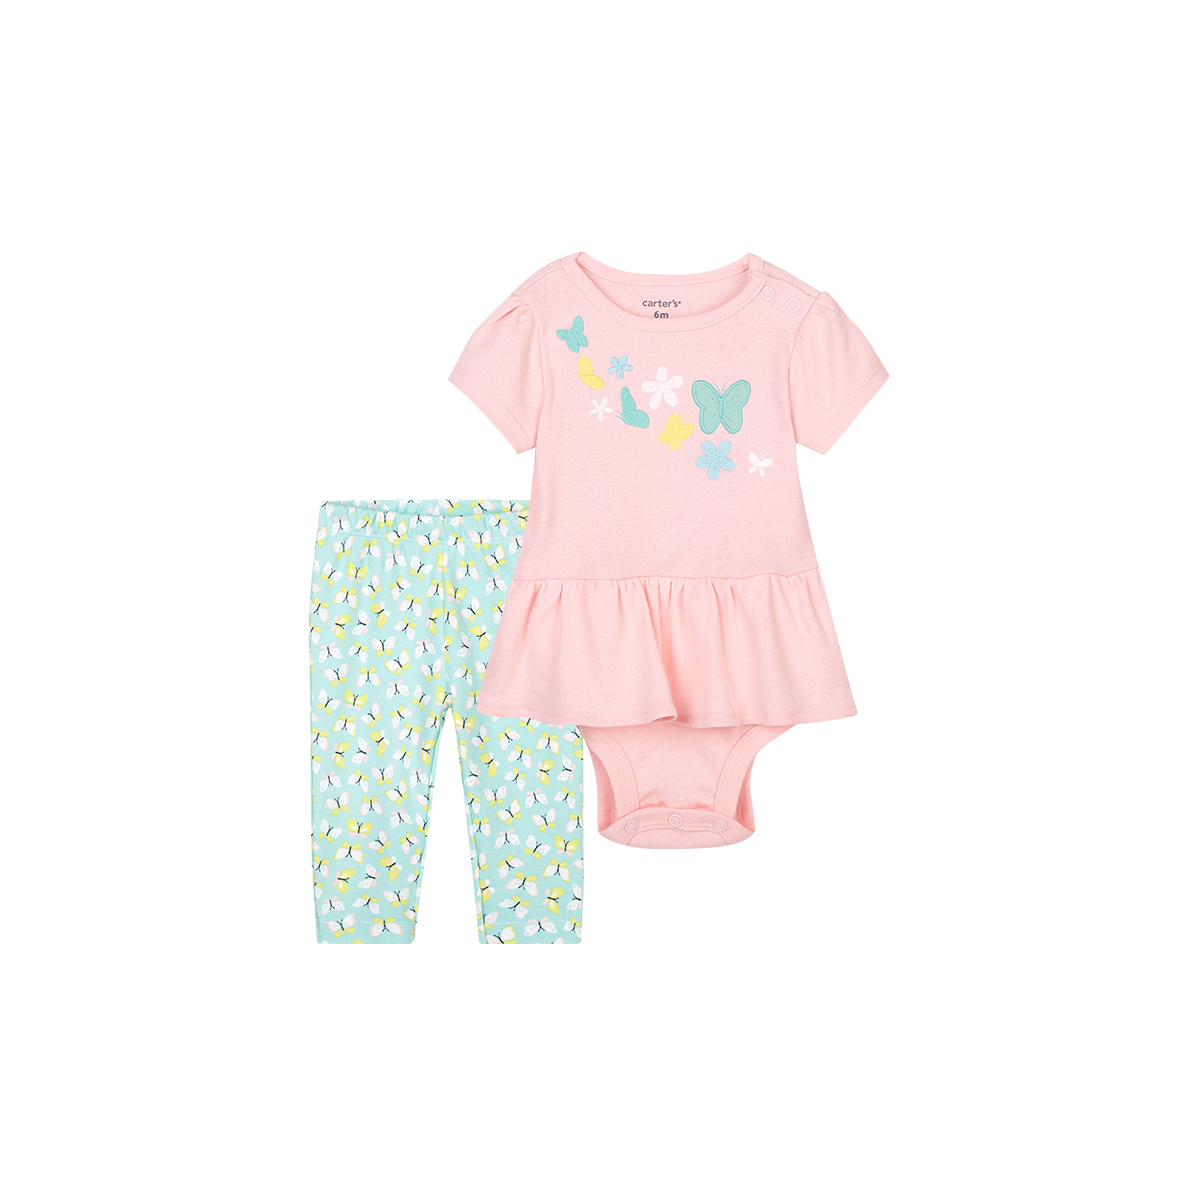 Carters baby one-piece sleeveless short climbing 2-piece set of pure cotton khaki climbing suit pants skirt female baby suit